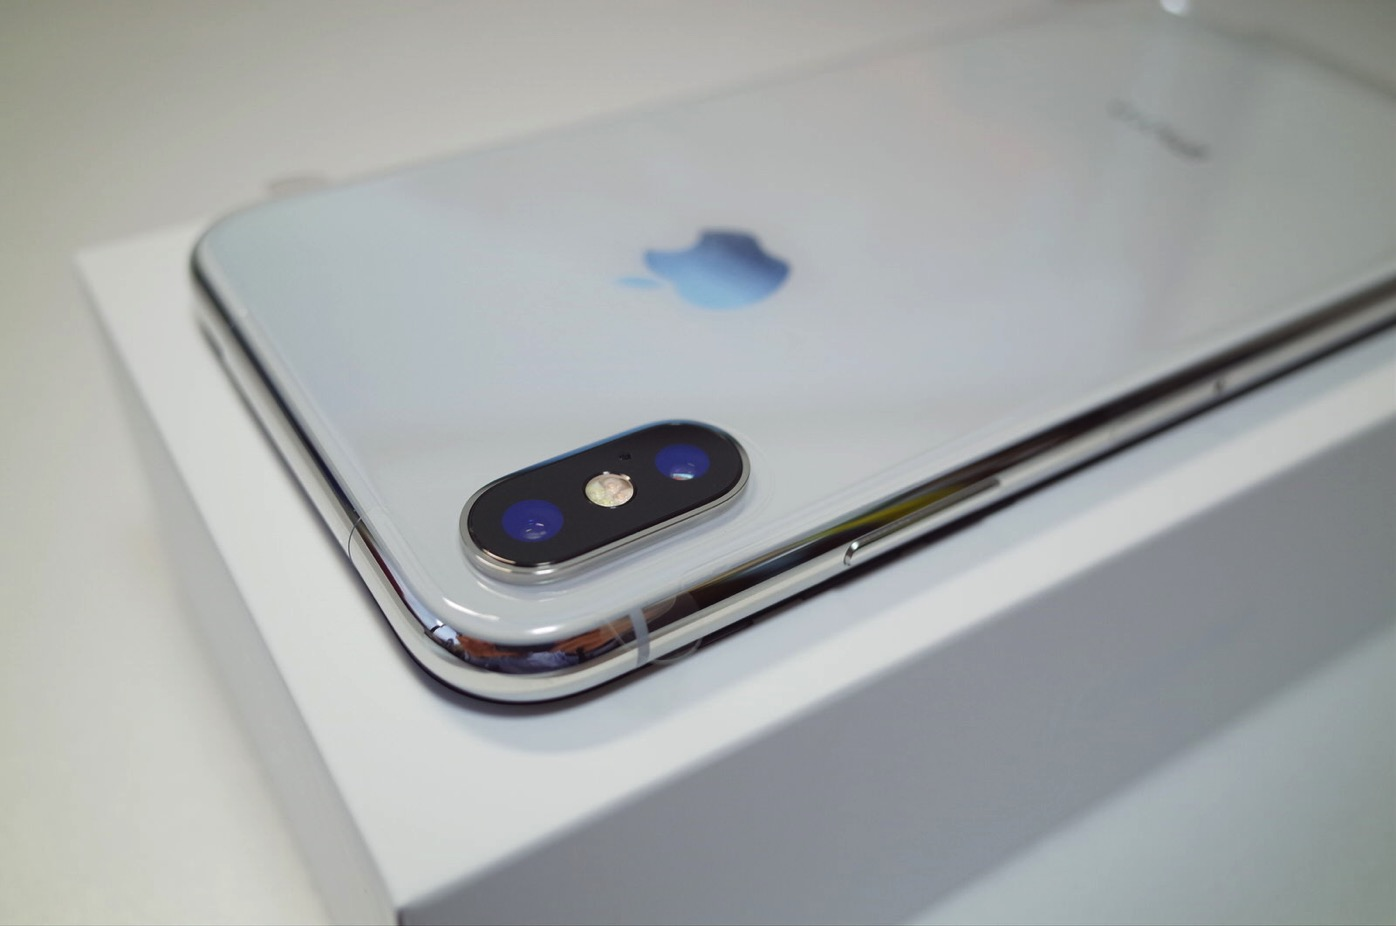 [iPhone] 丸3年間大活躍してくれた愛機 iPhone X を手放すときがやってきた